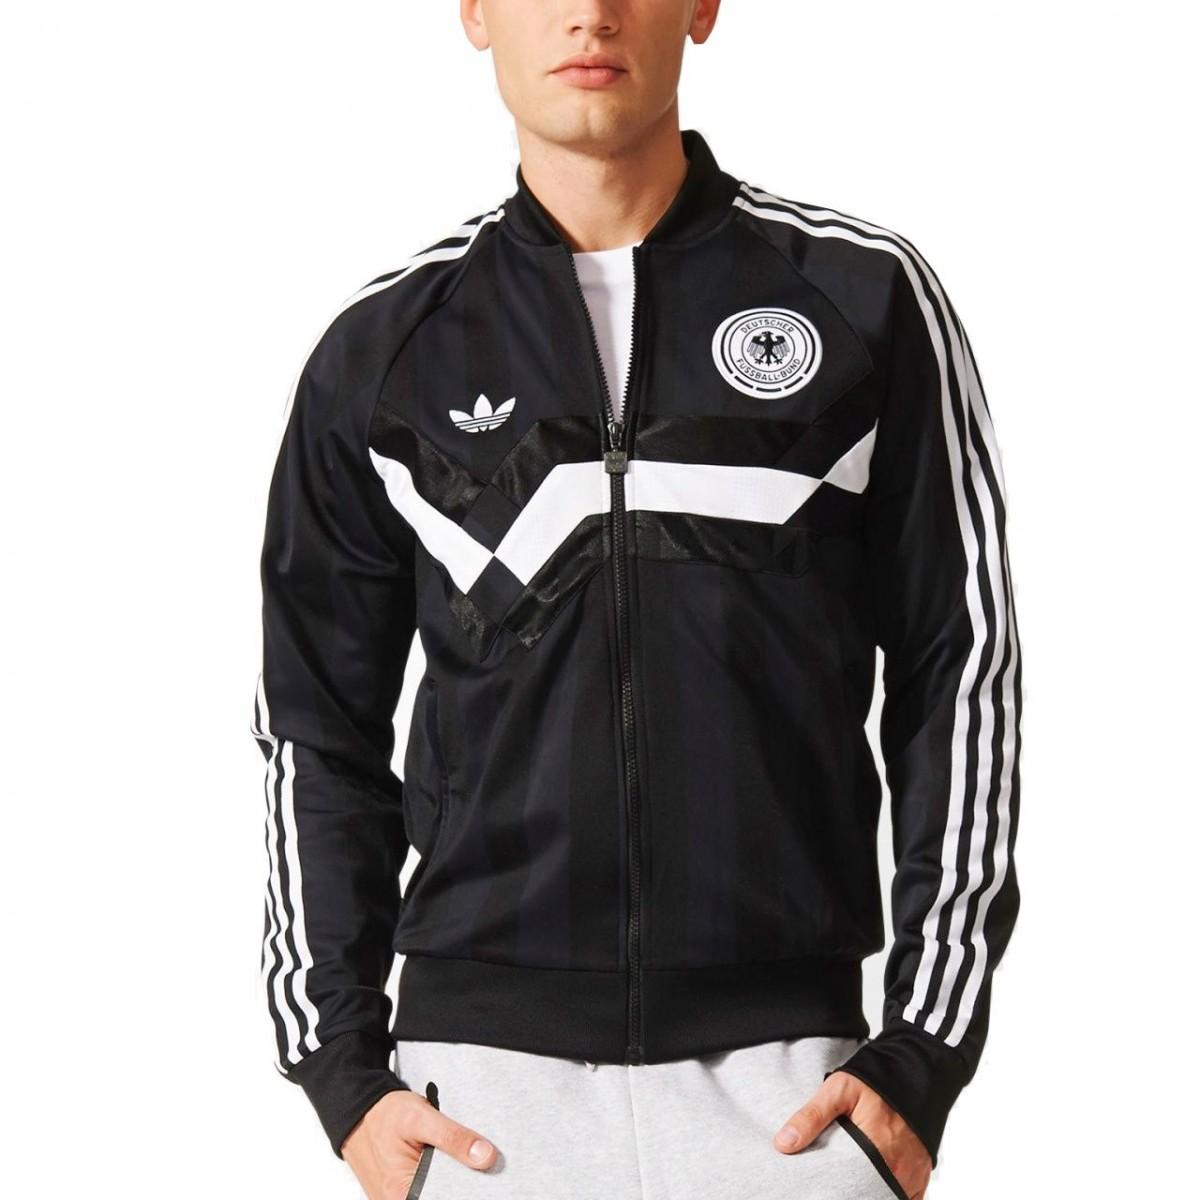 49c83a5d12 Jaqueta Adidas Germany